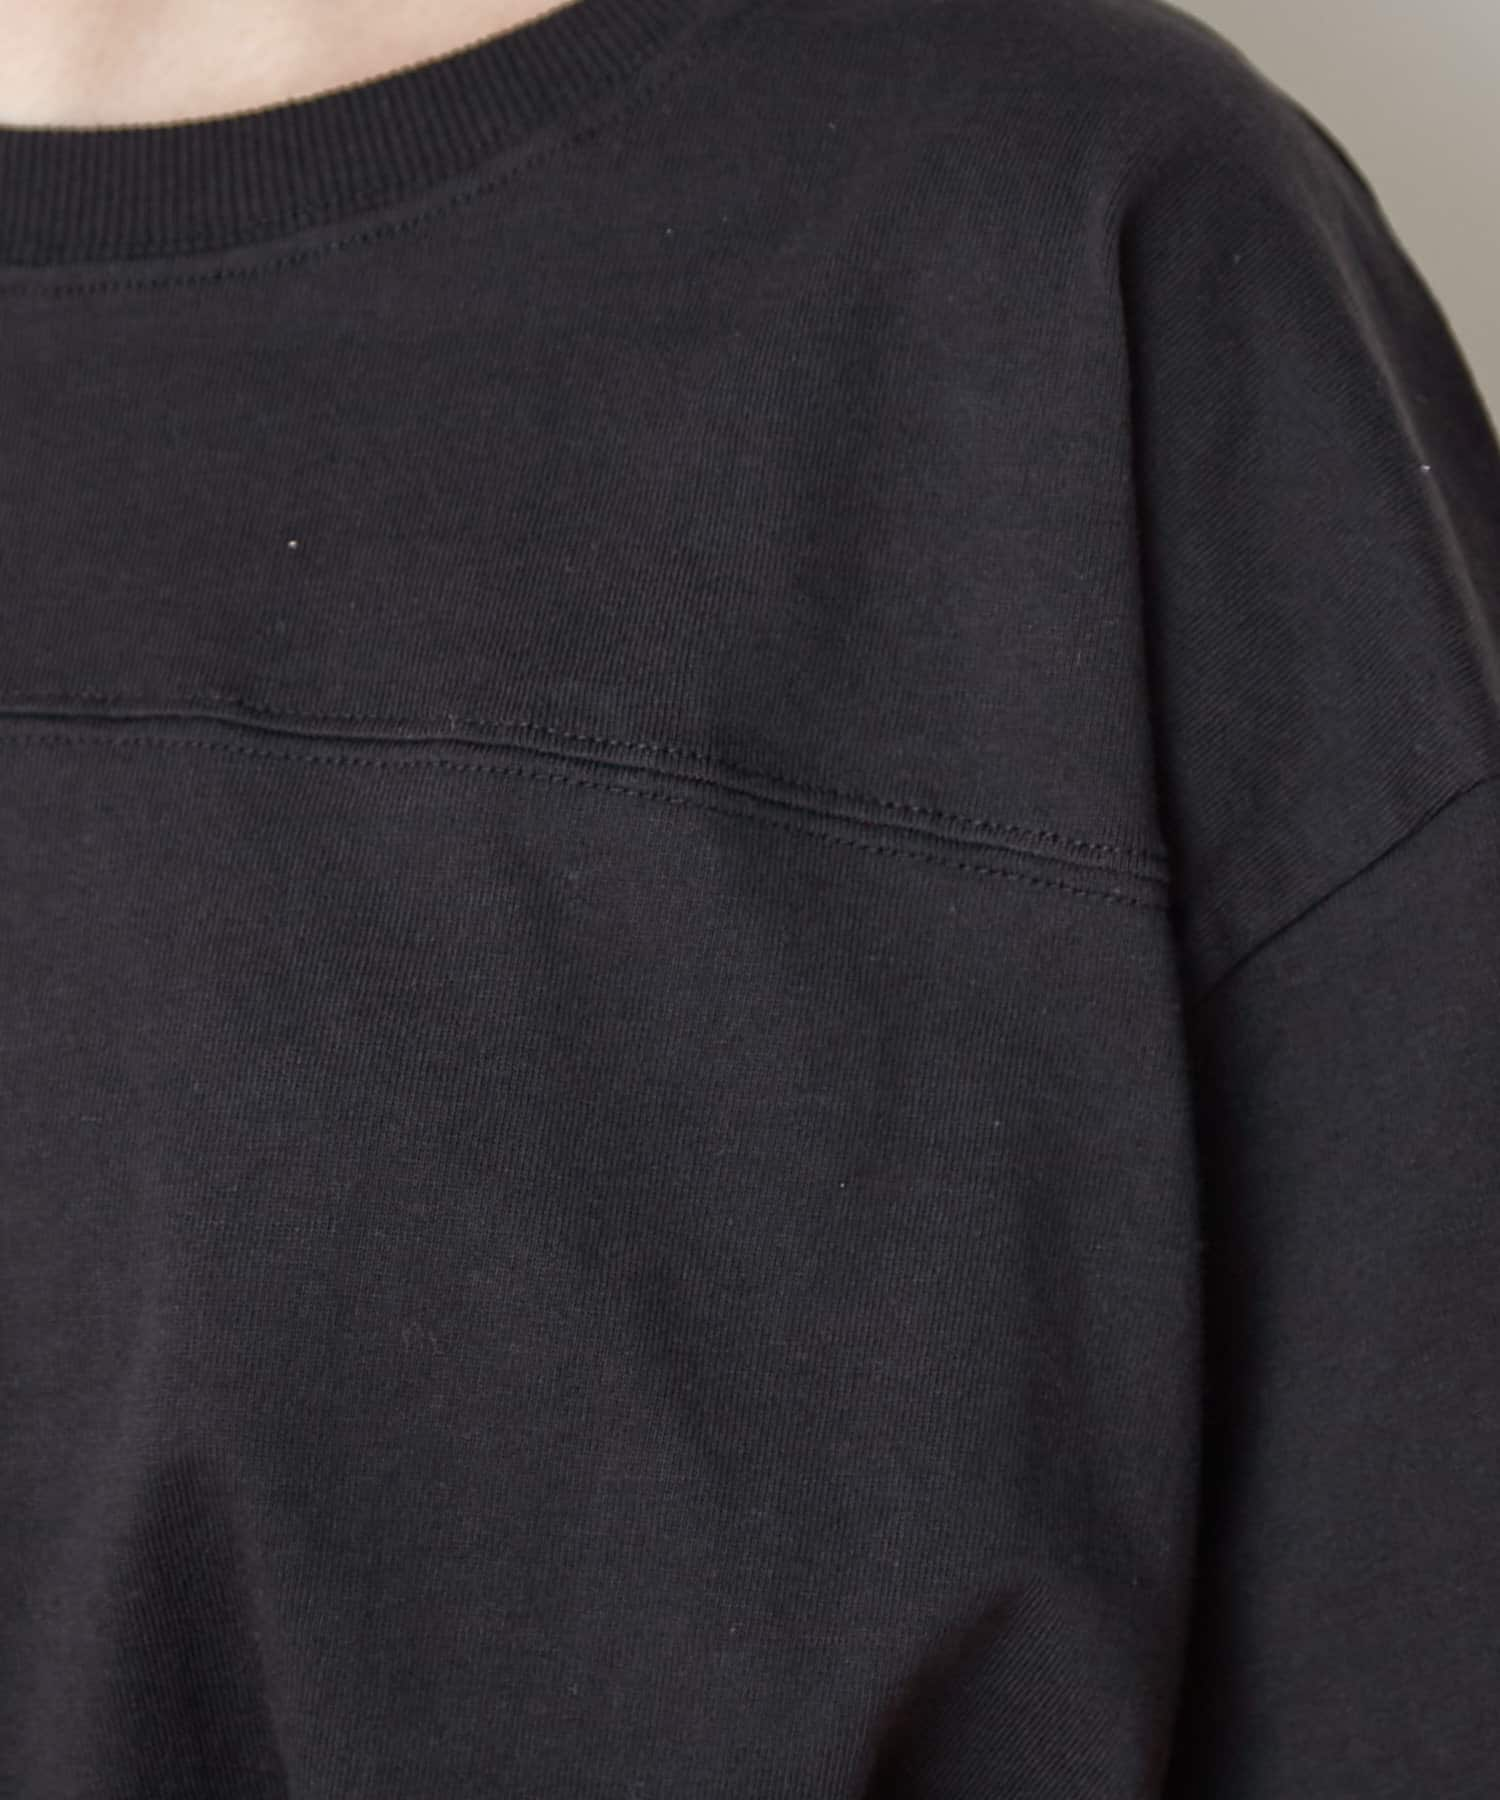 NICE CLAUP OUTLET(ナイスクラップ アウトレット) フットボールTシャツ